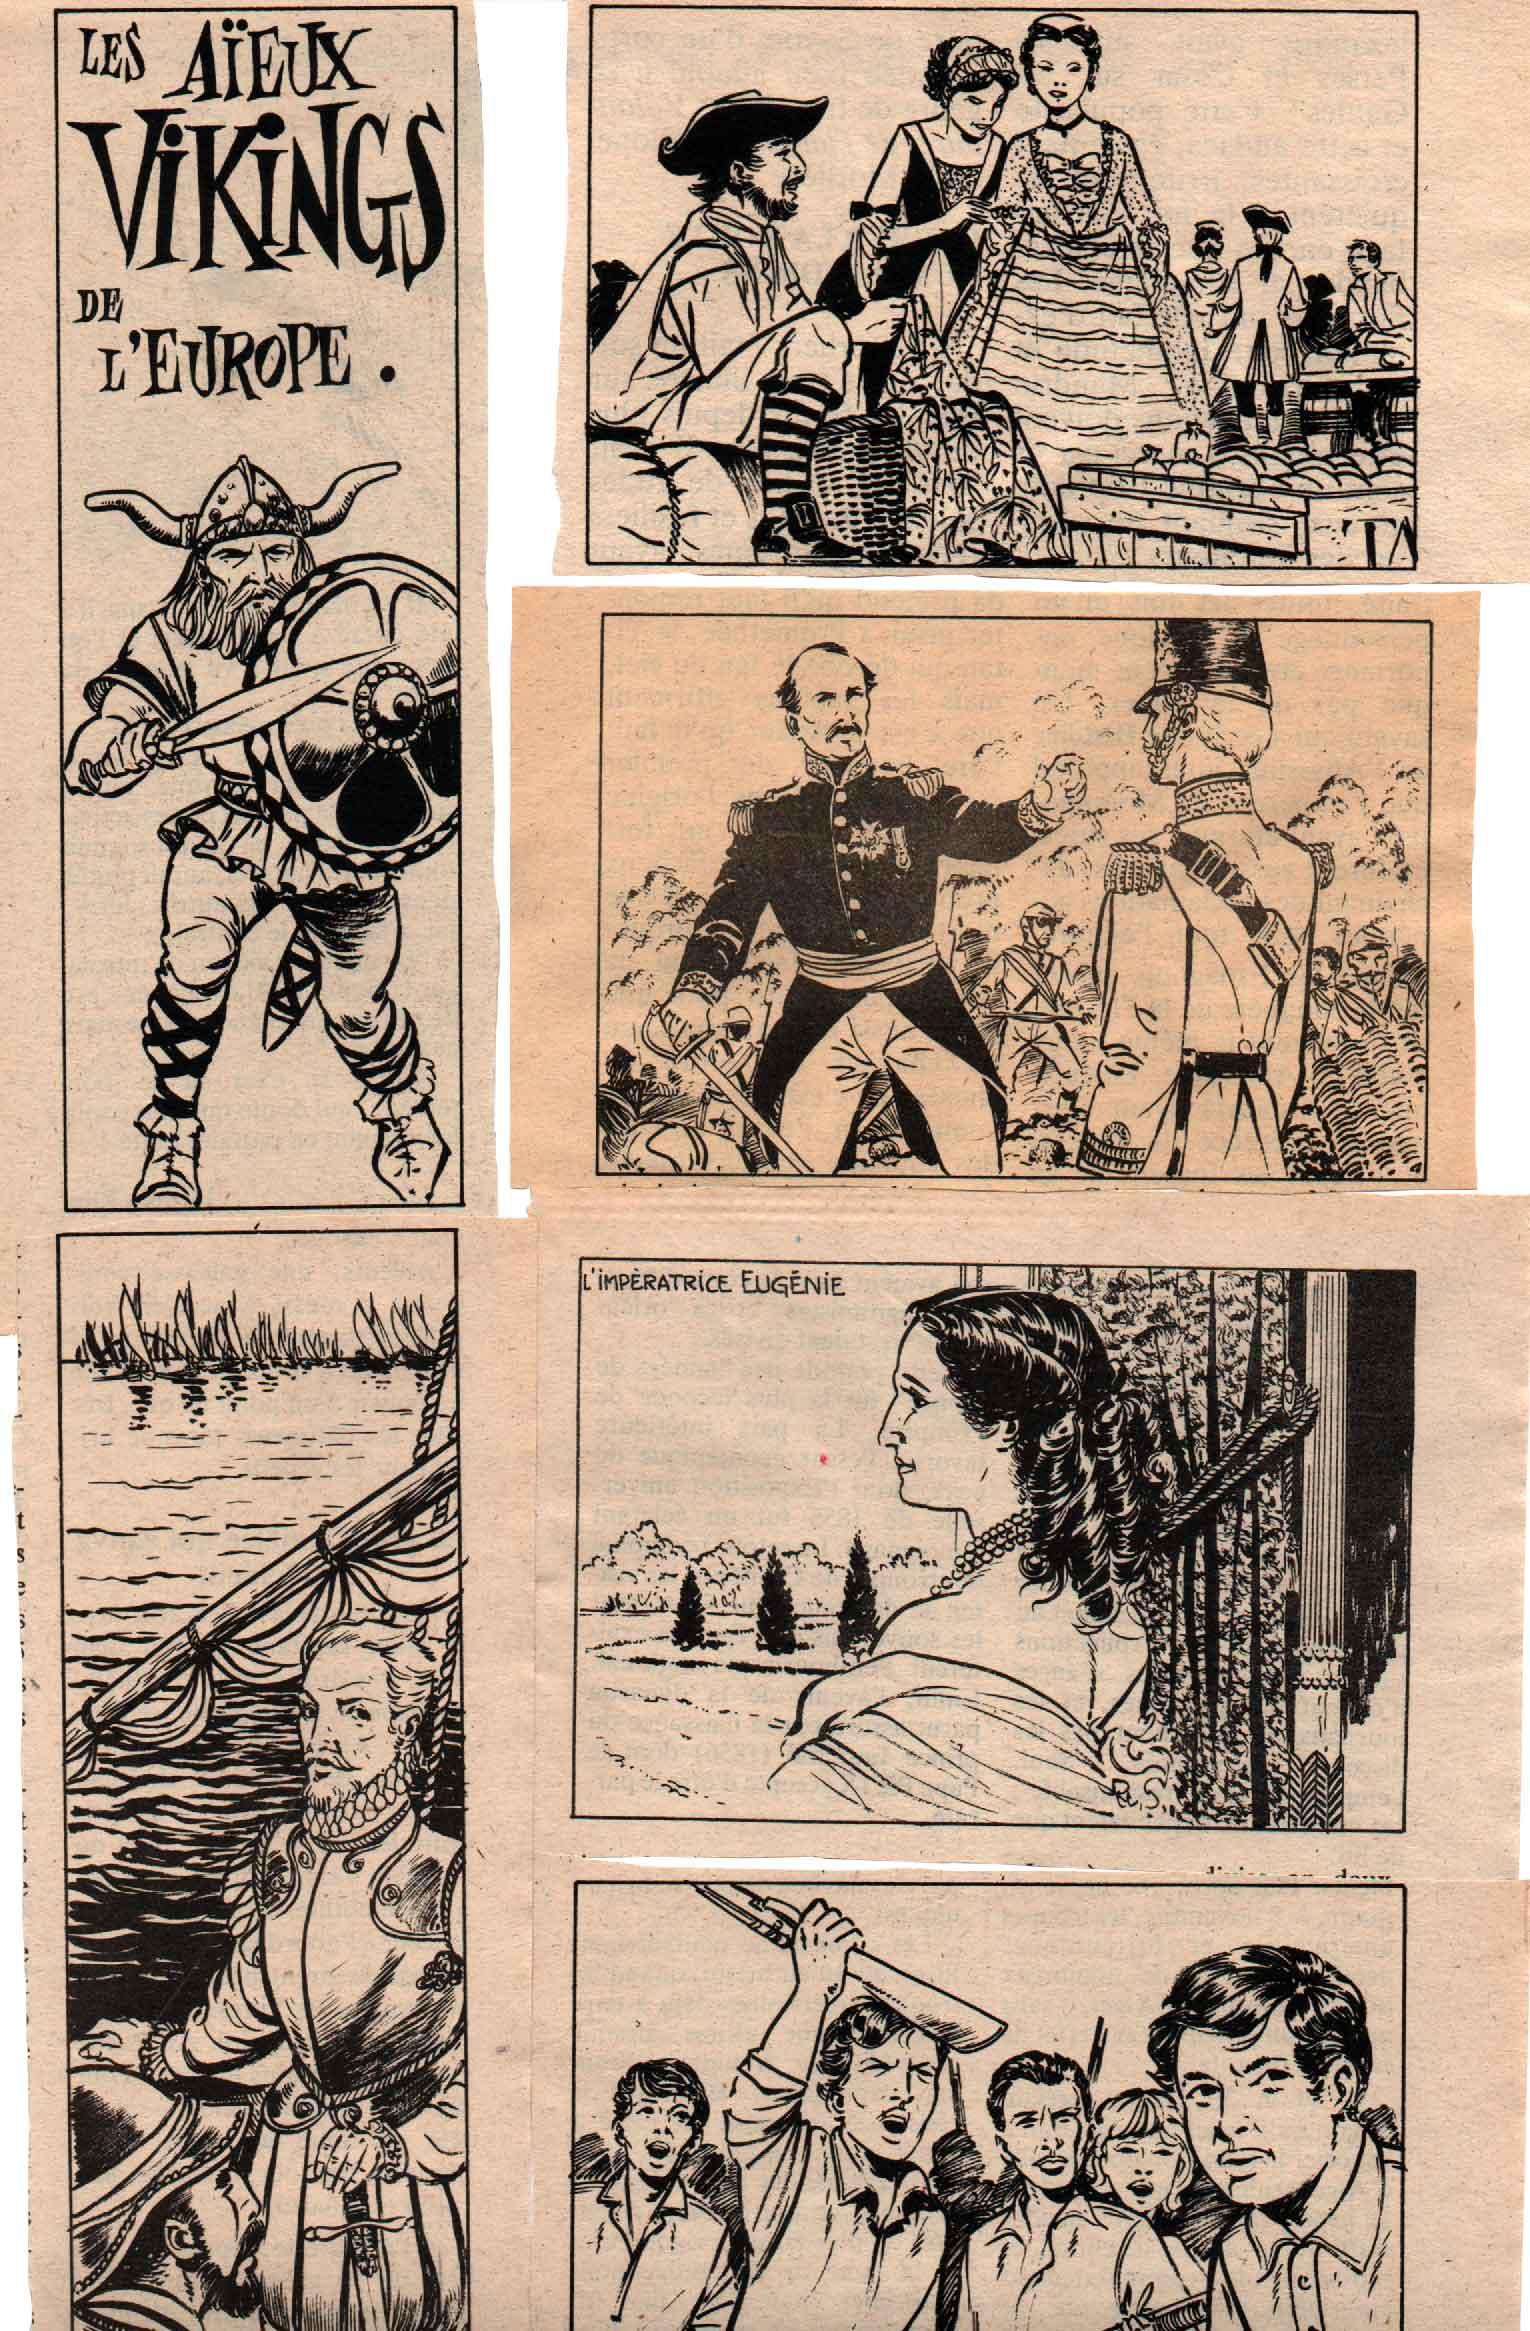 Illustrations Aventures et voyages.